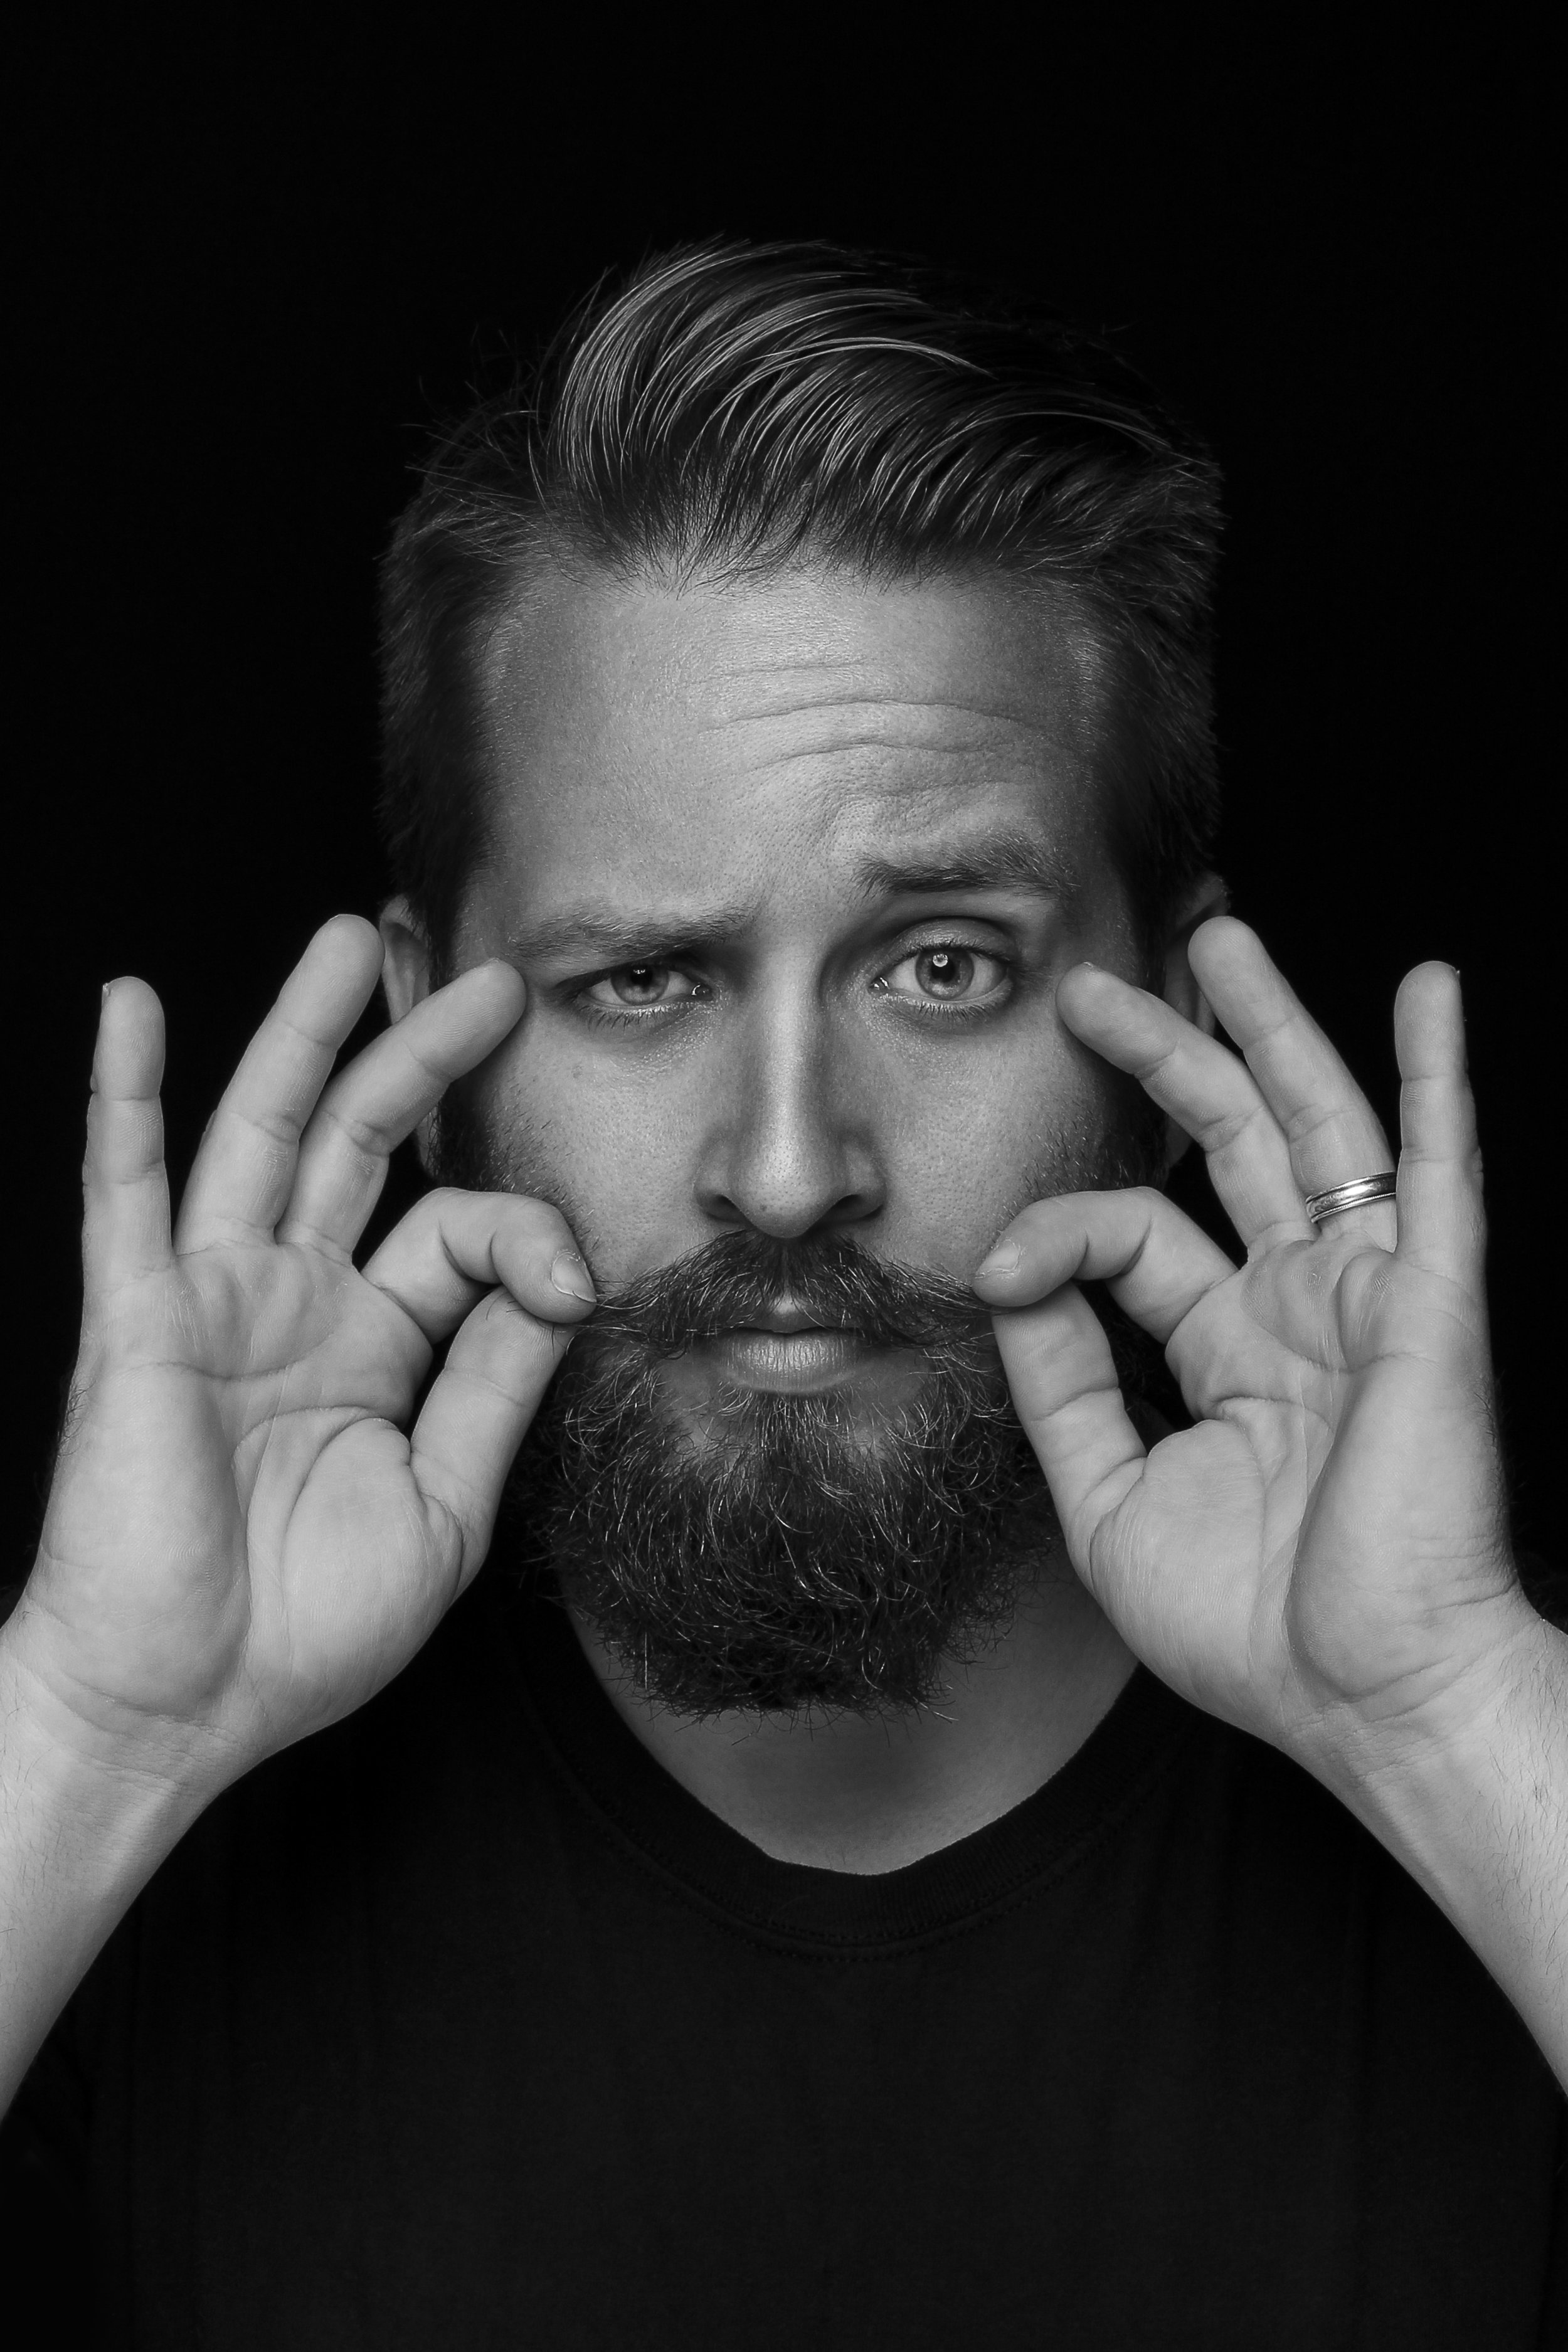 Ryan Sims - Photographer/Videographer